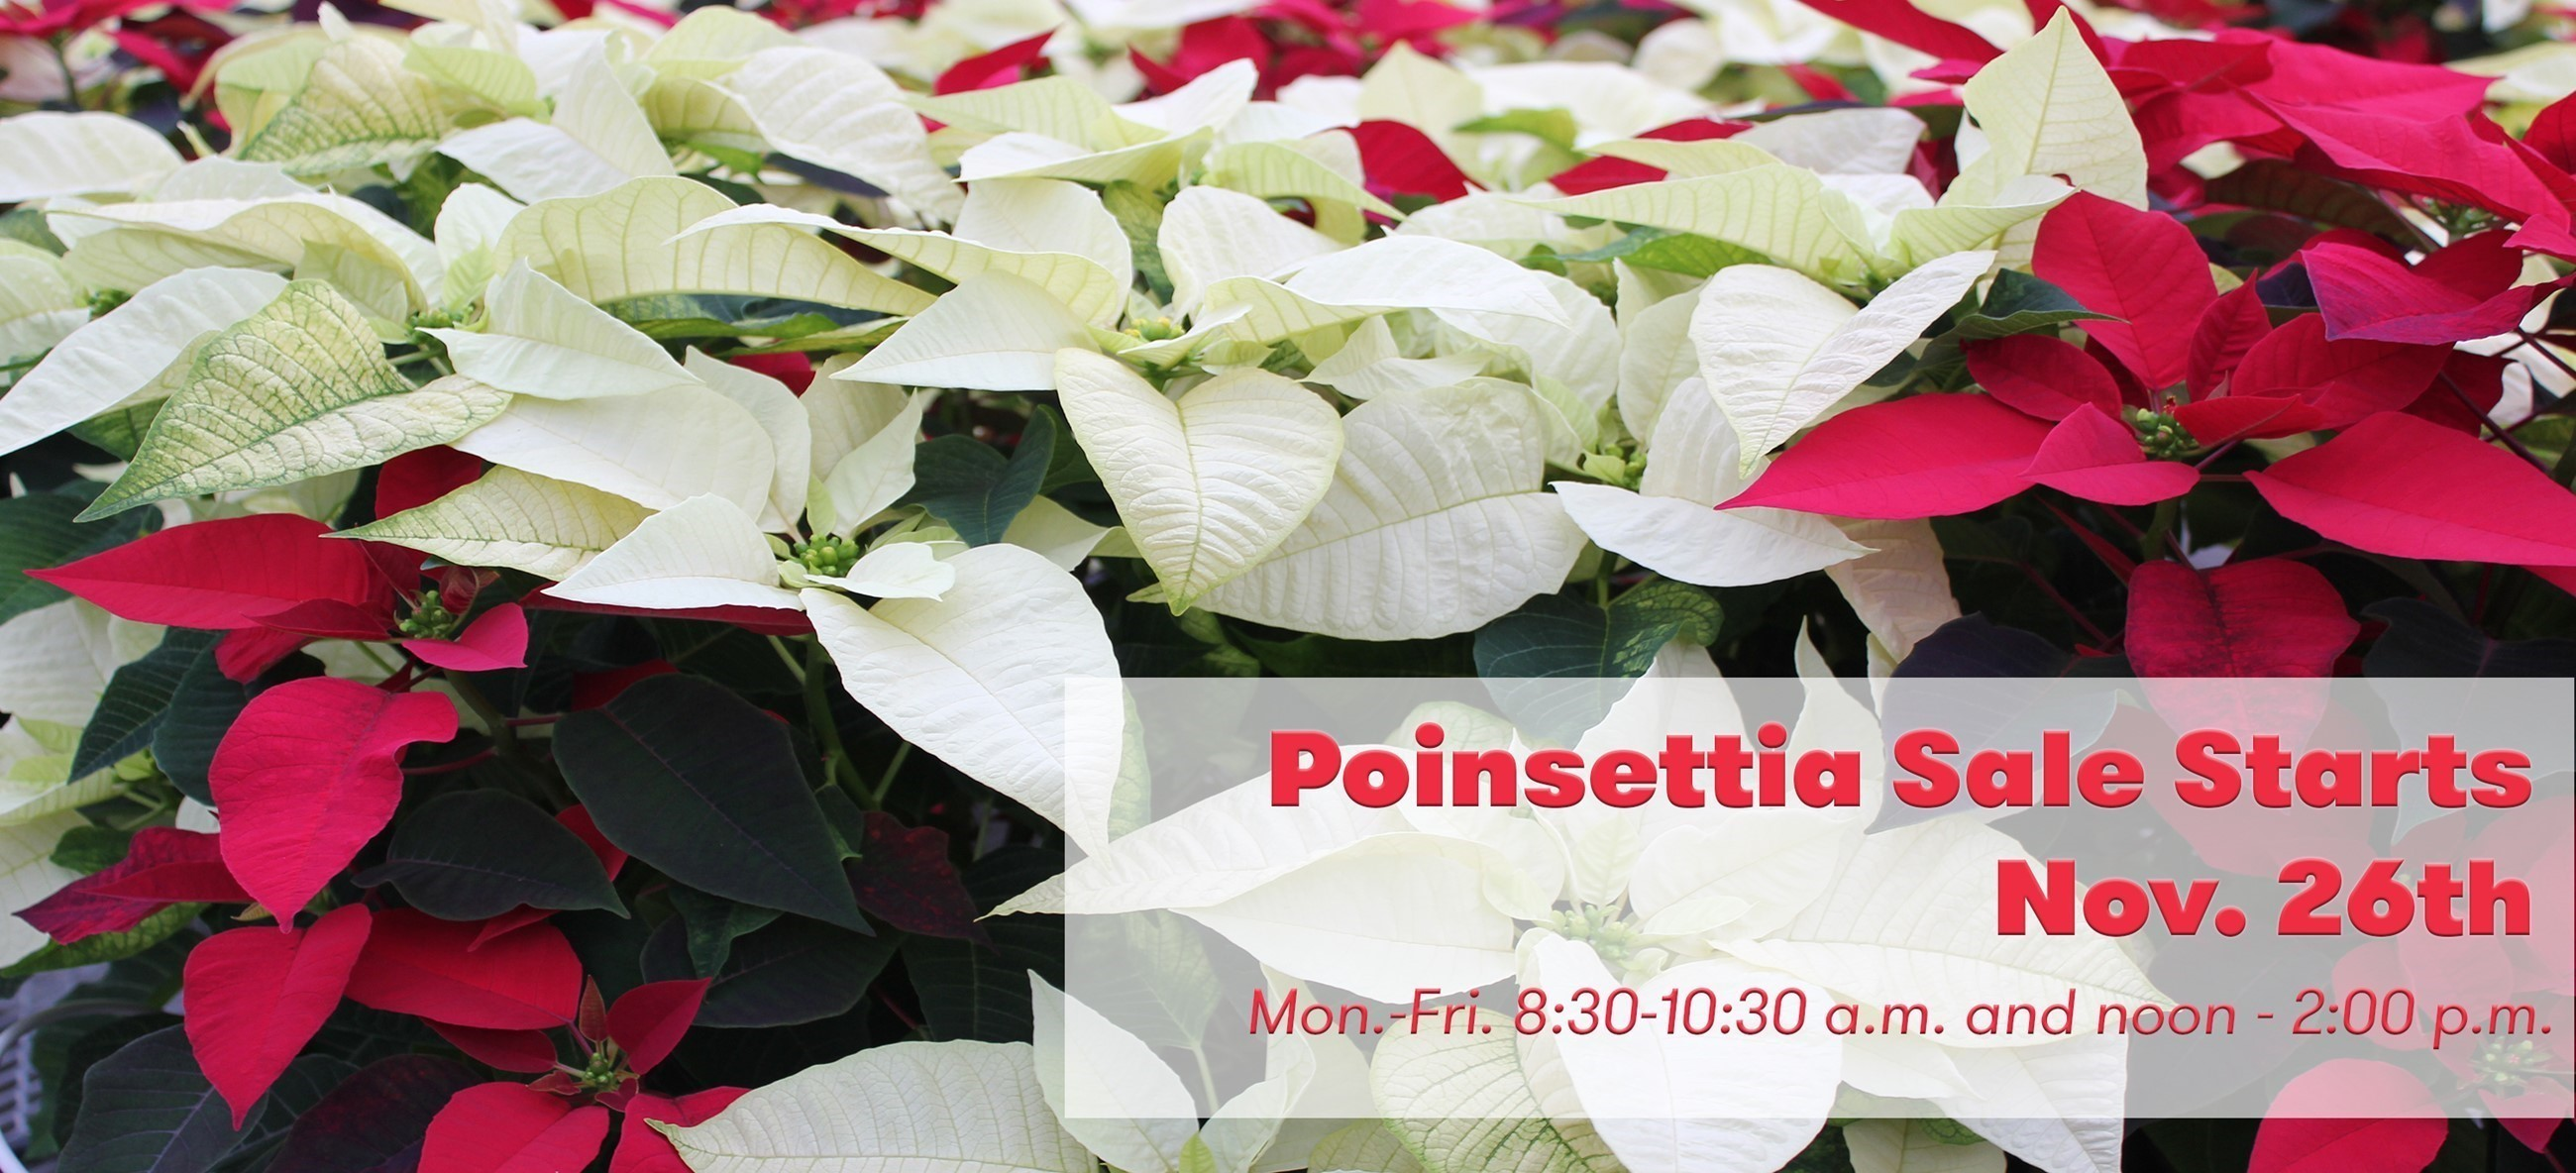 Poinsettia Sale Starts Nov. 26